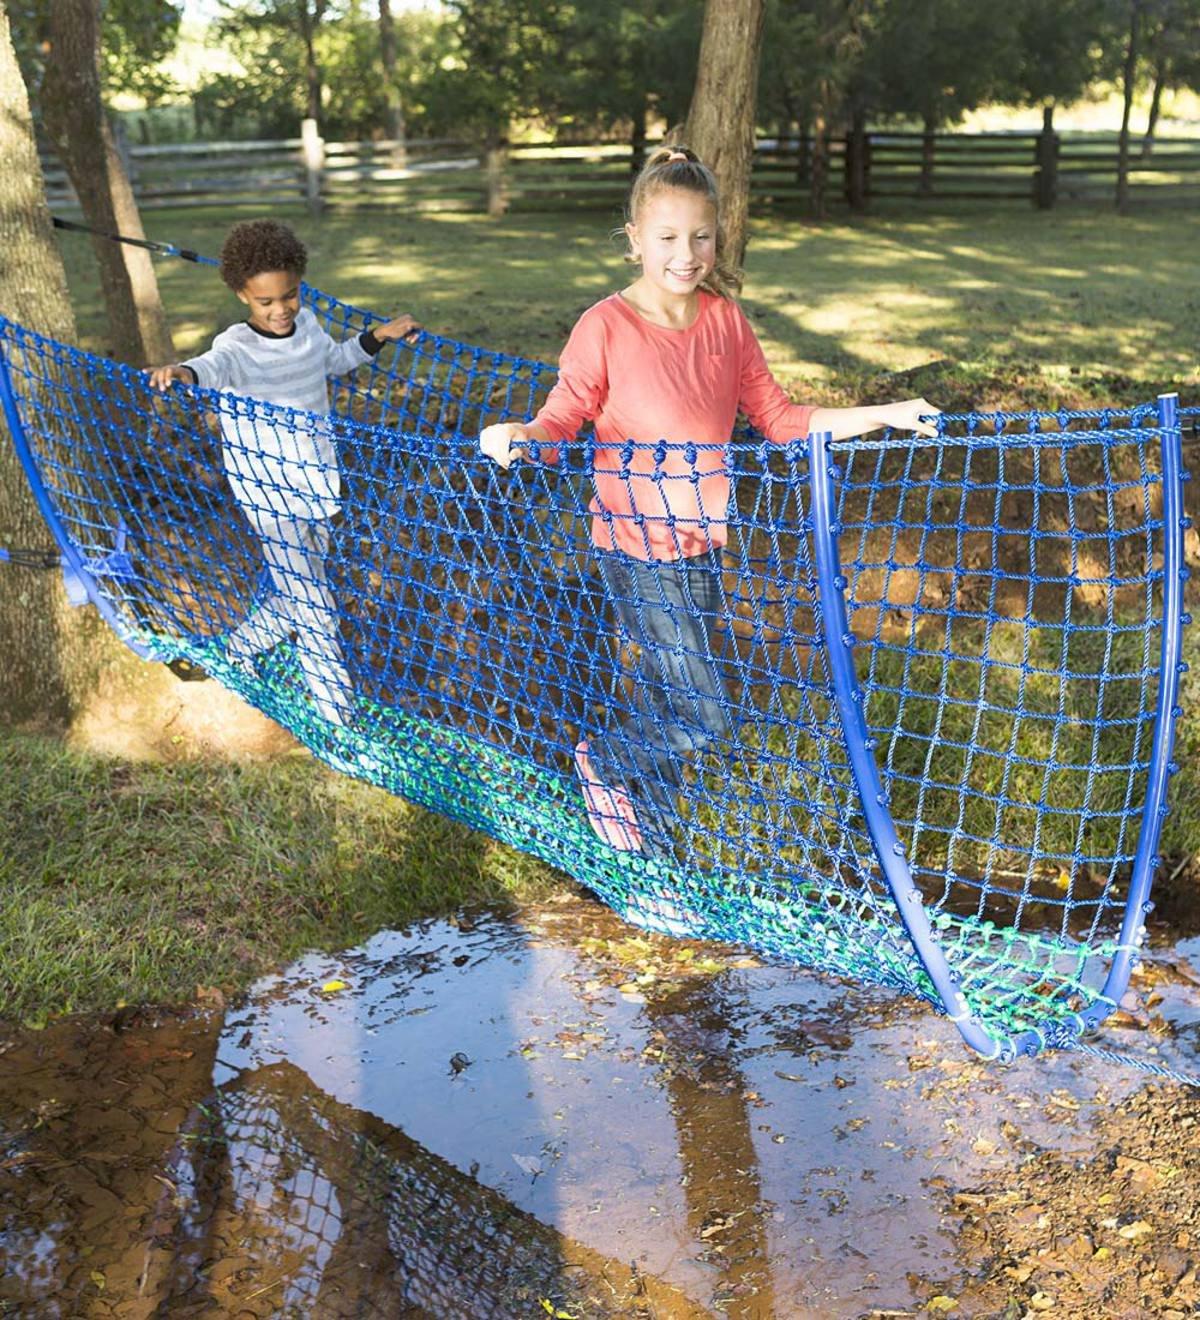 HearthSong® Balance Rope Bridge, Children's Backyard Playground Equipment, Approx. 8 ft Long by HearthSong